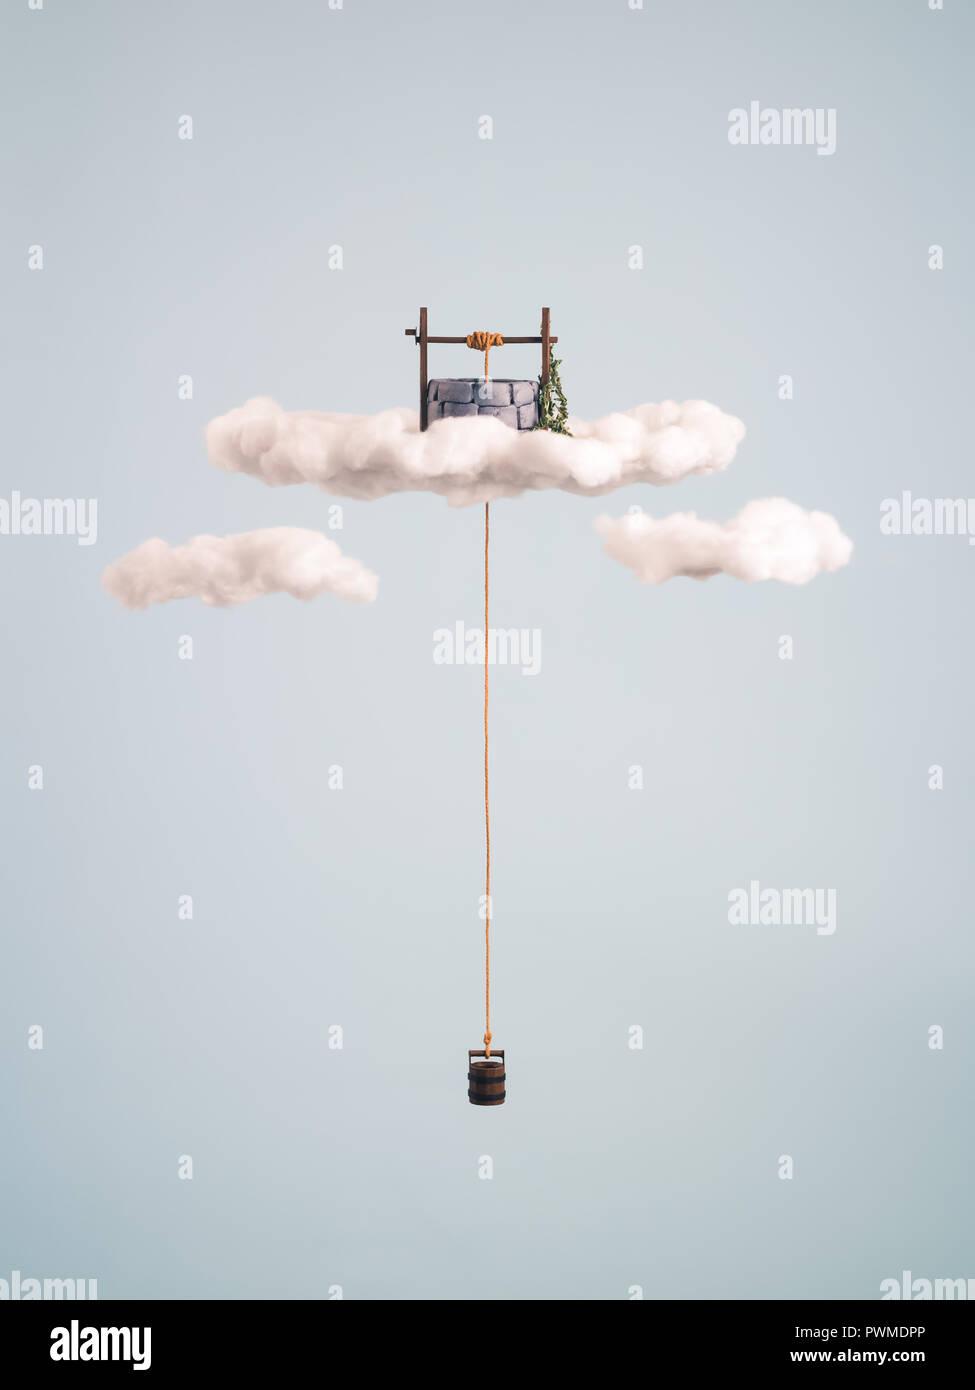 Wishing well floating on the sky - Stock Image